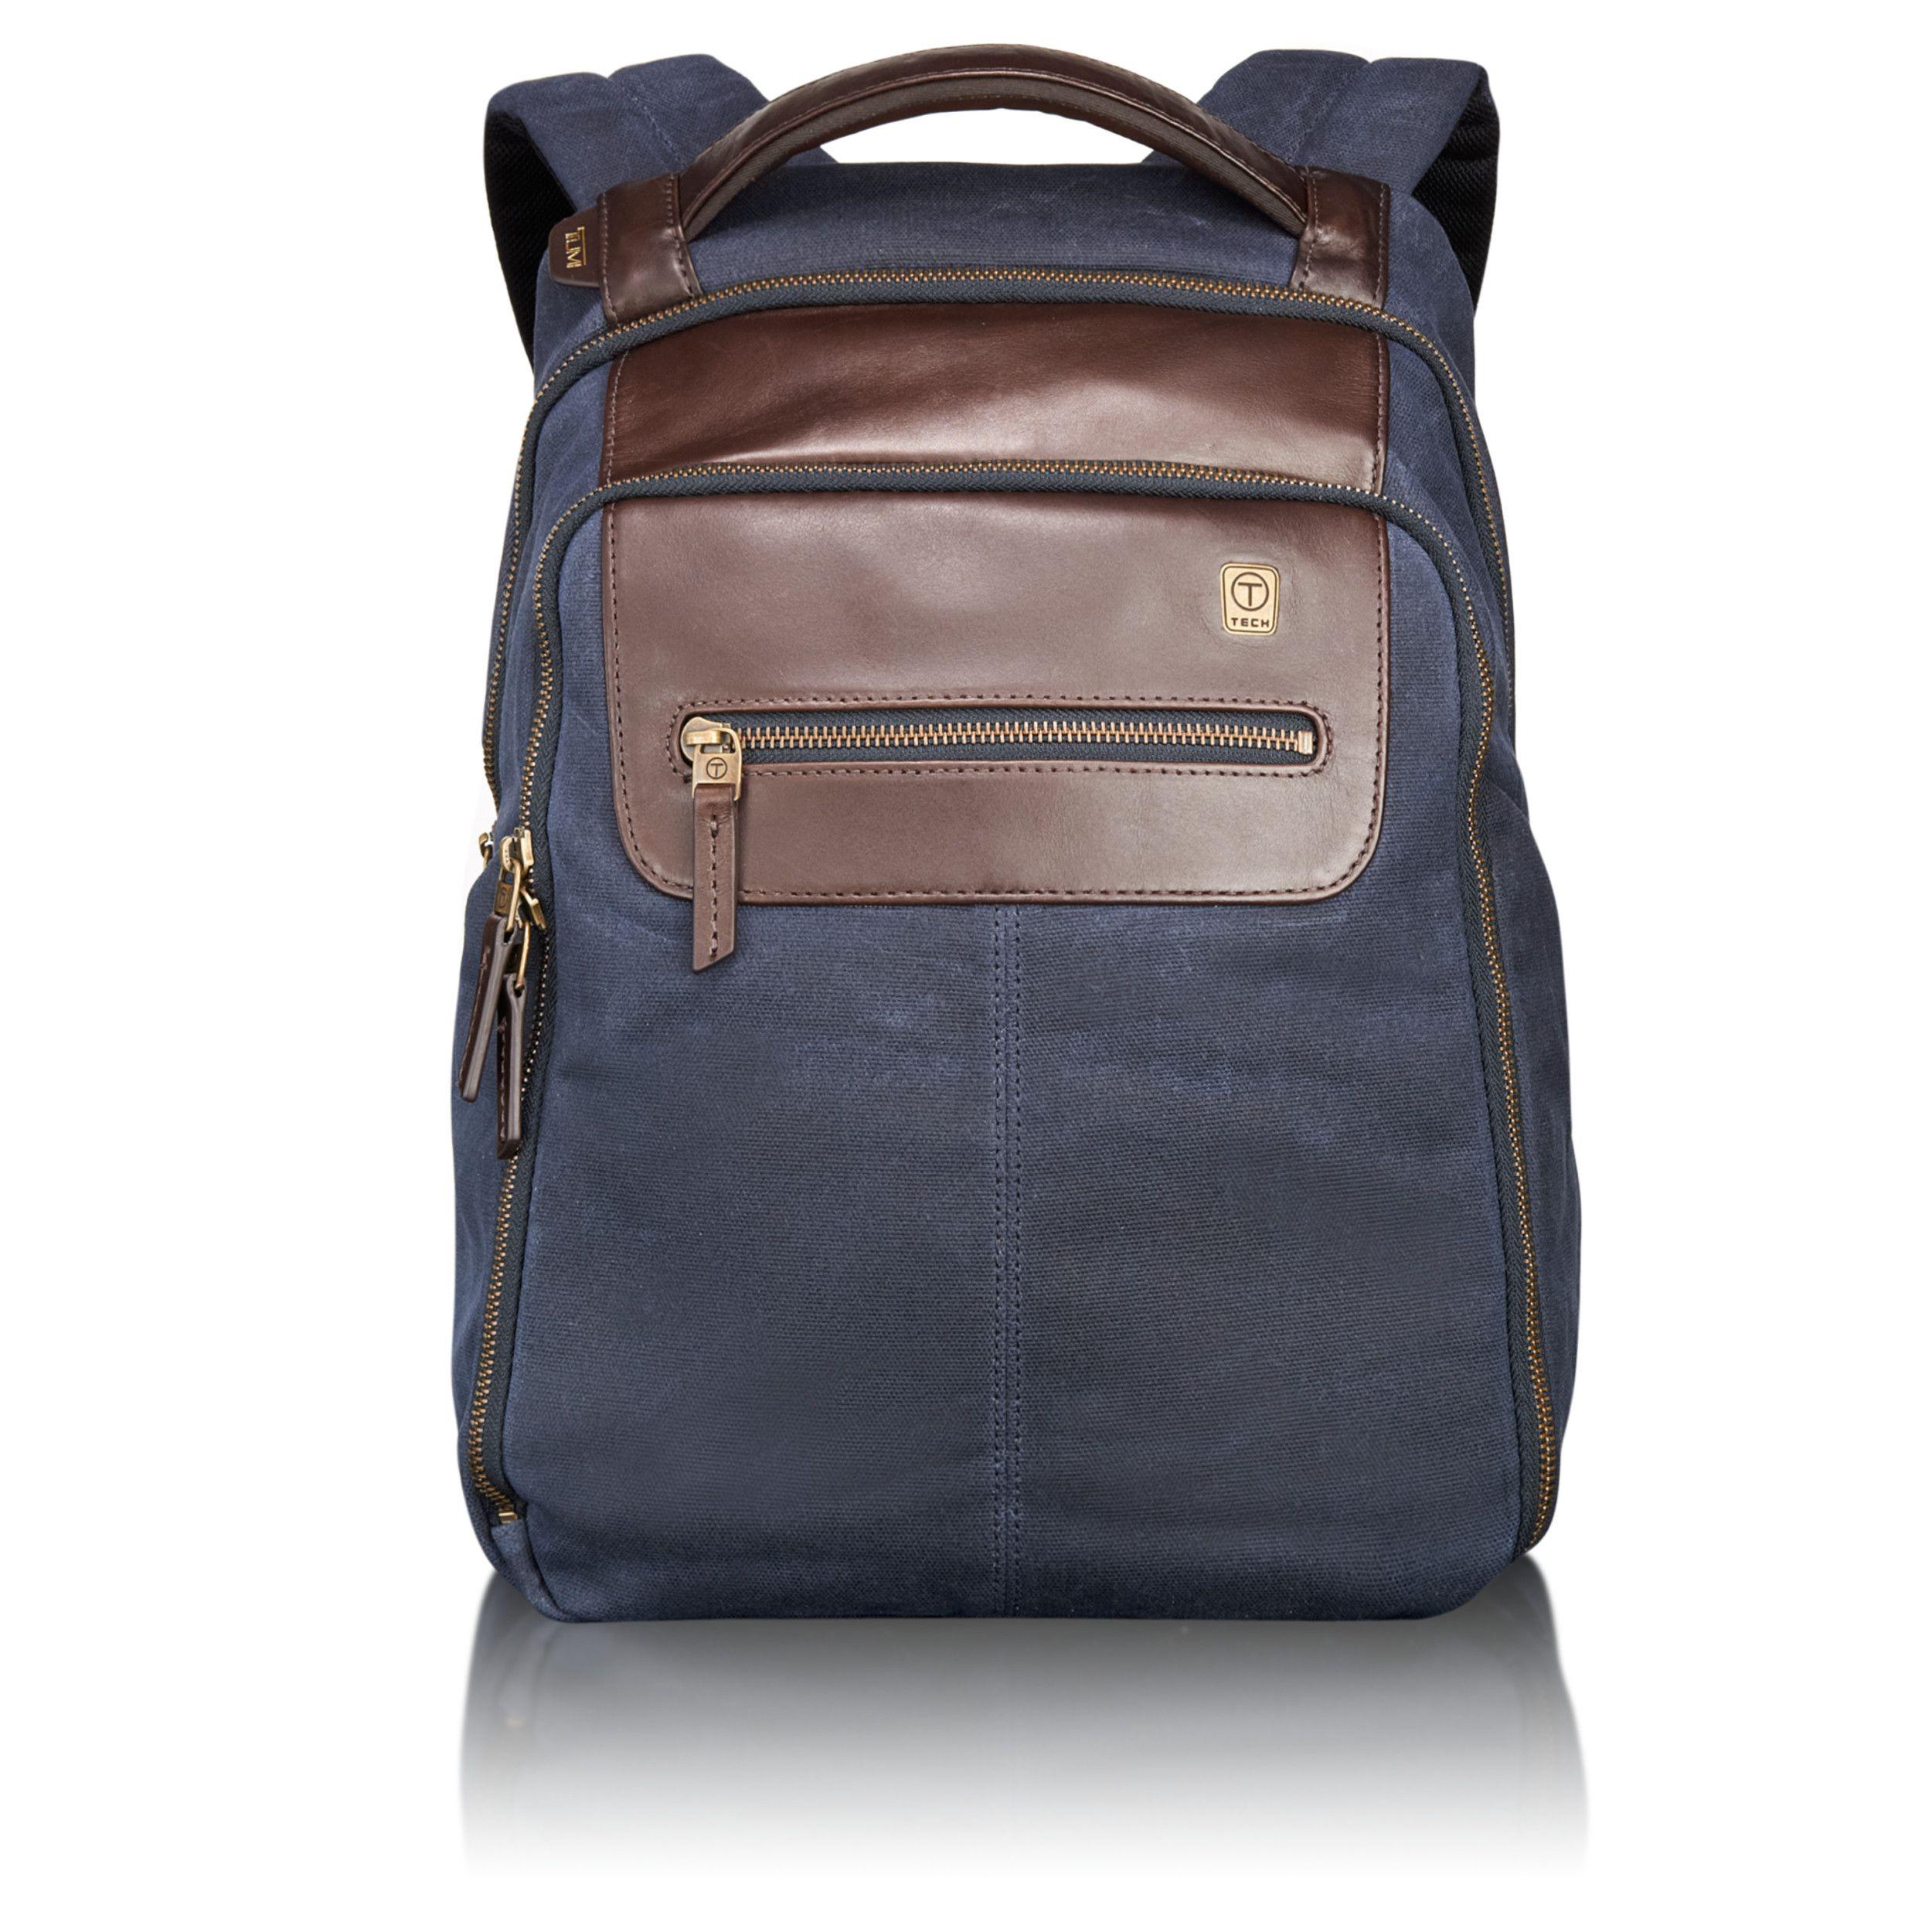 steel city slim backpack tumi wear pinterest tumi